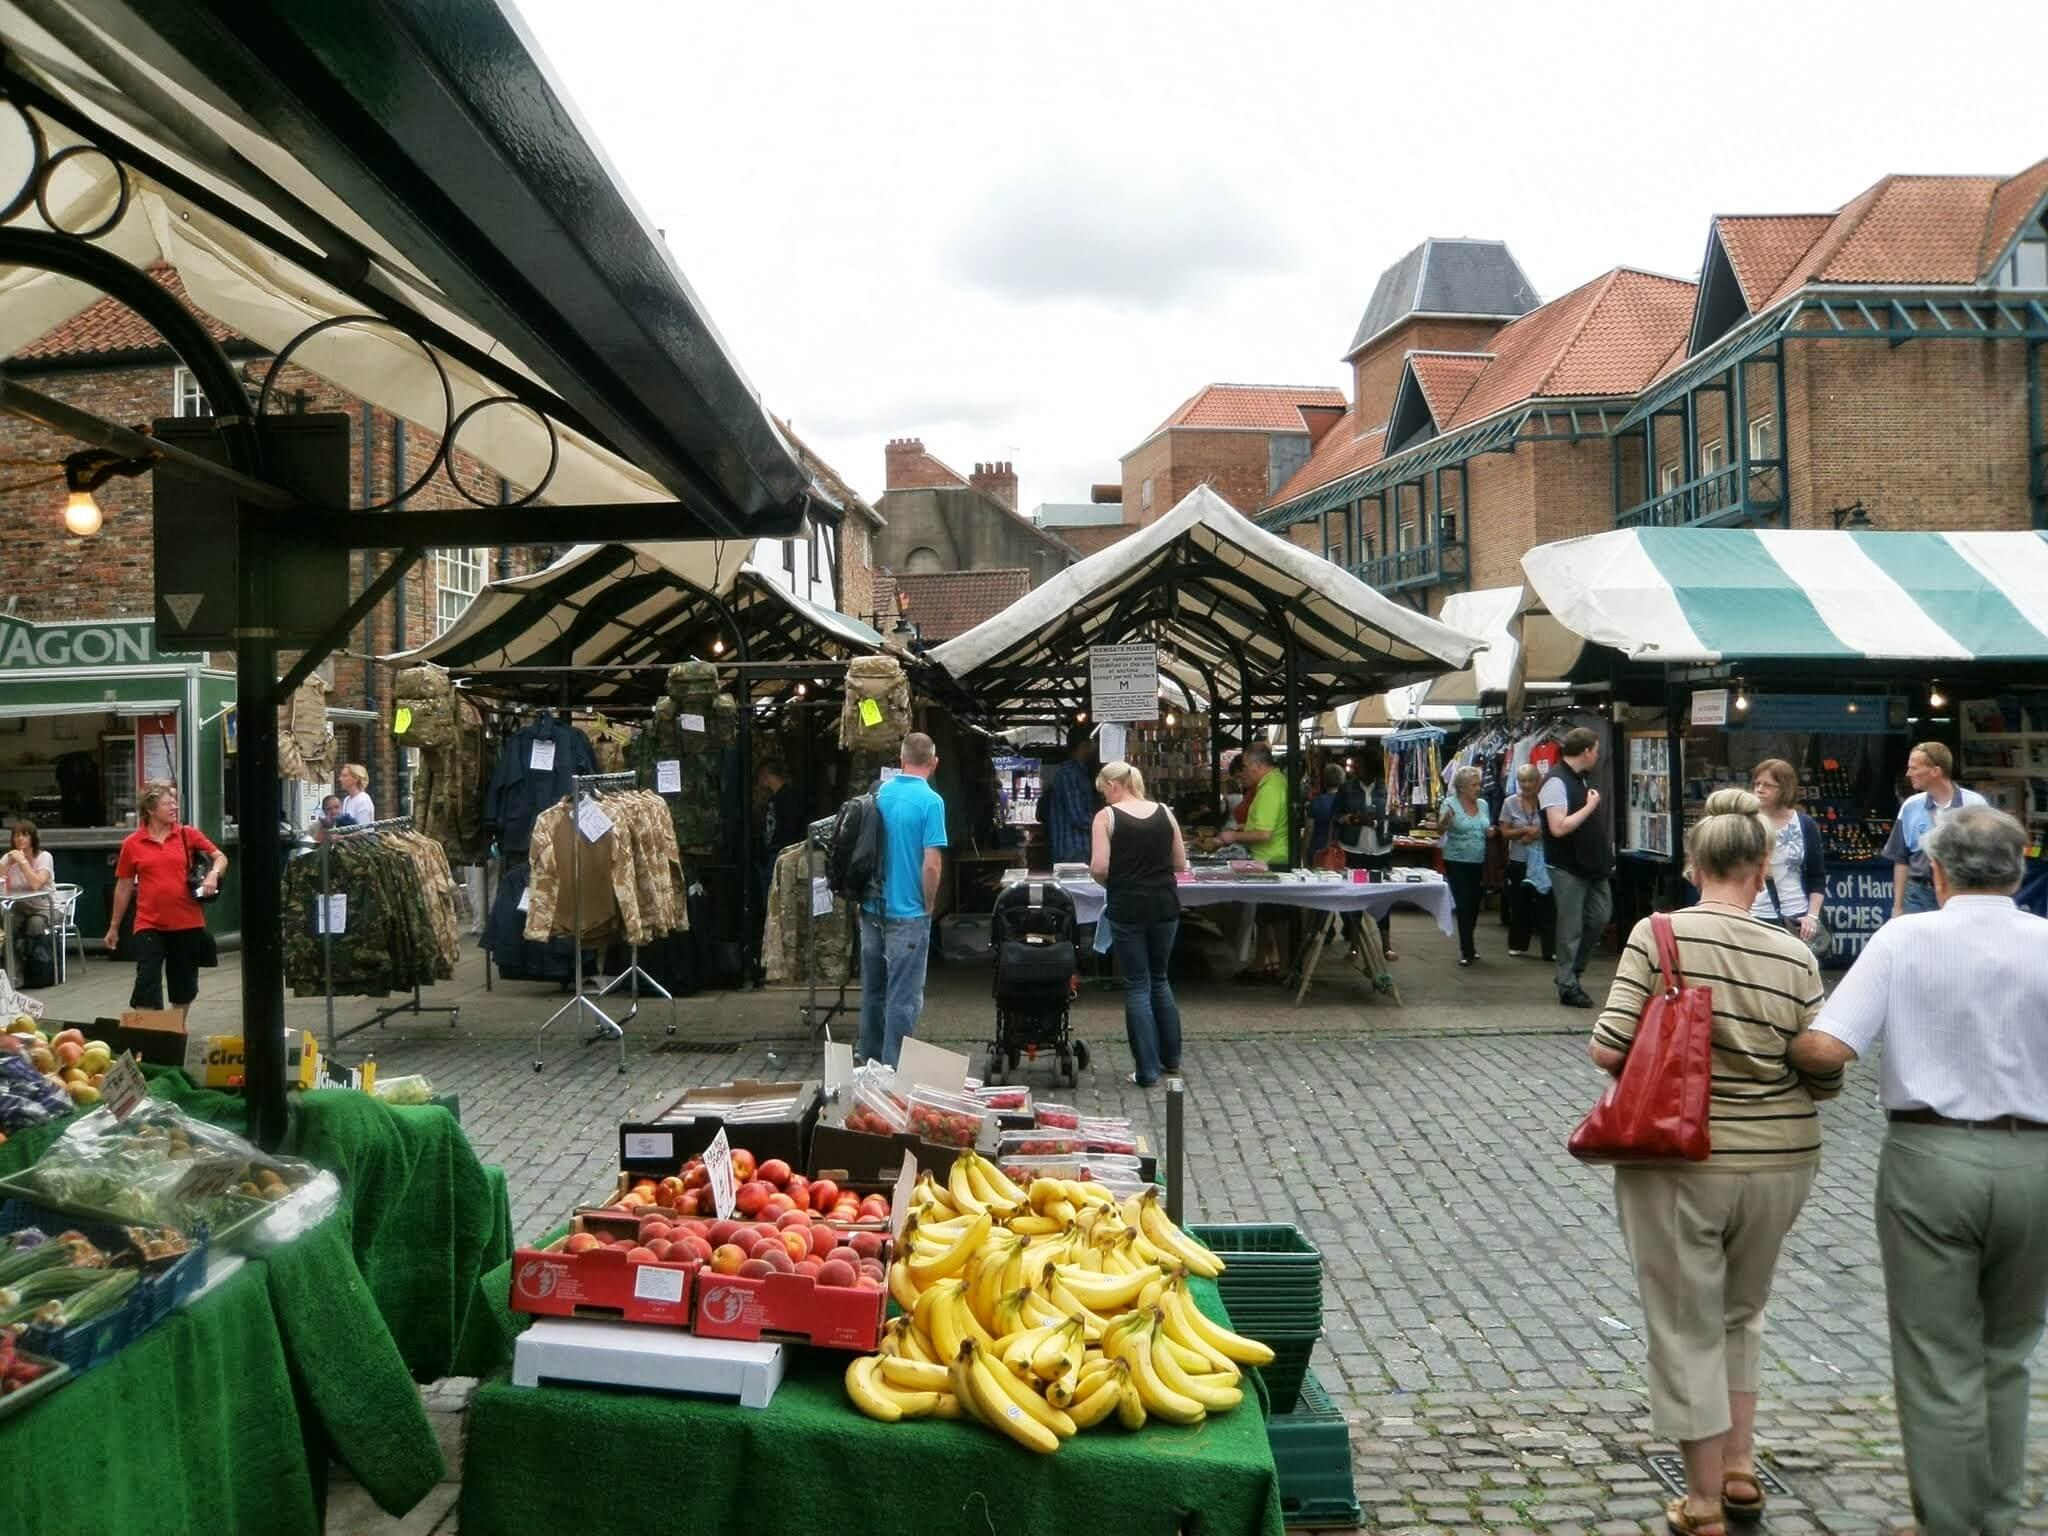 York: Market